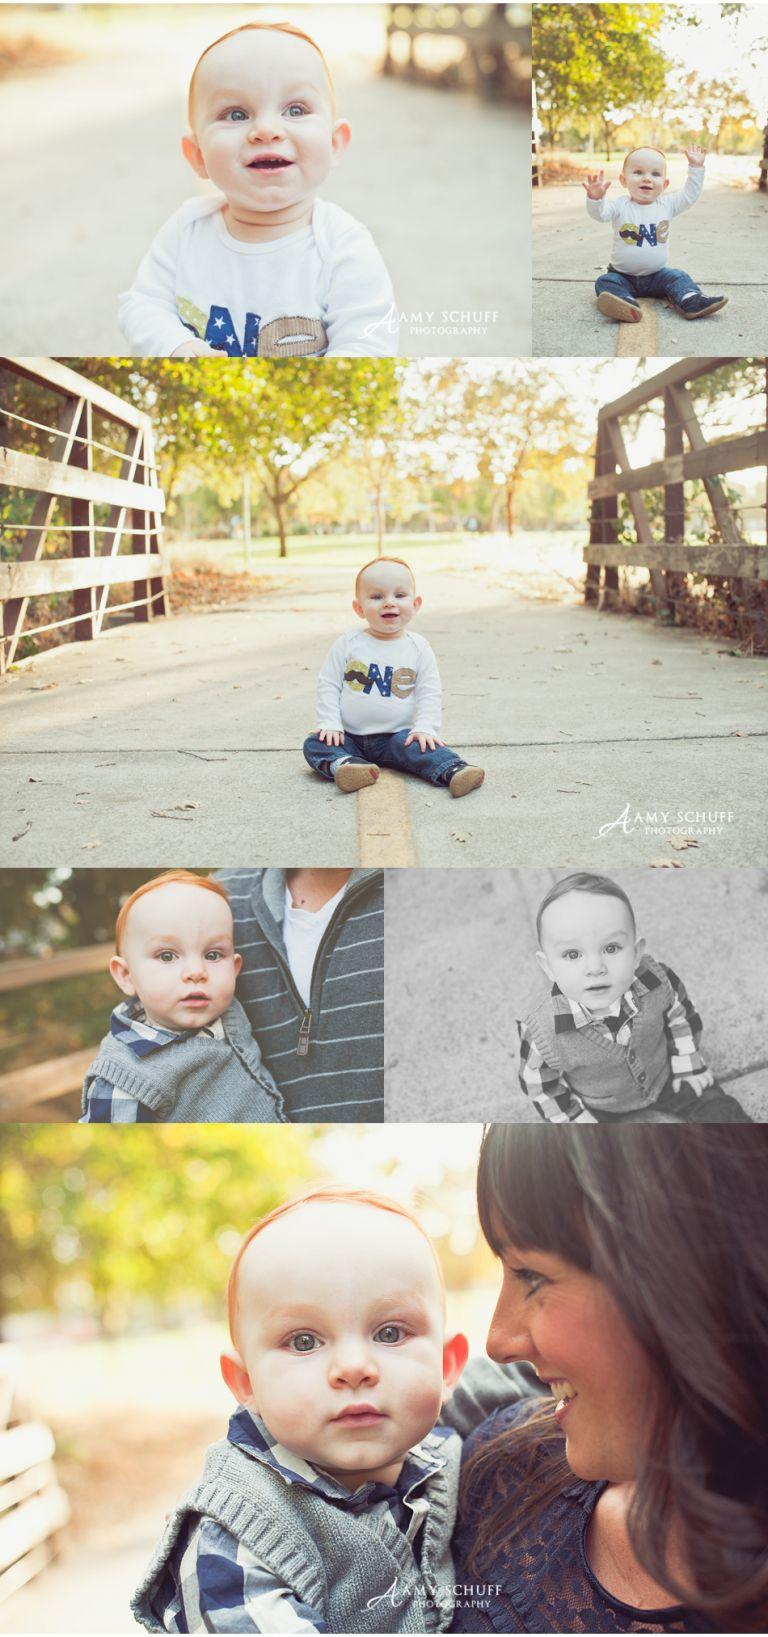 Amy Schuff Photography - Sacramento, CA Family Photographer